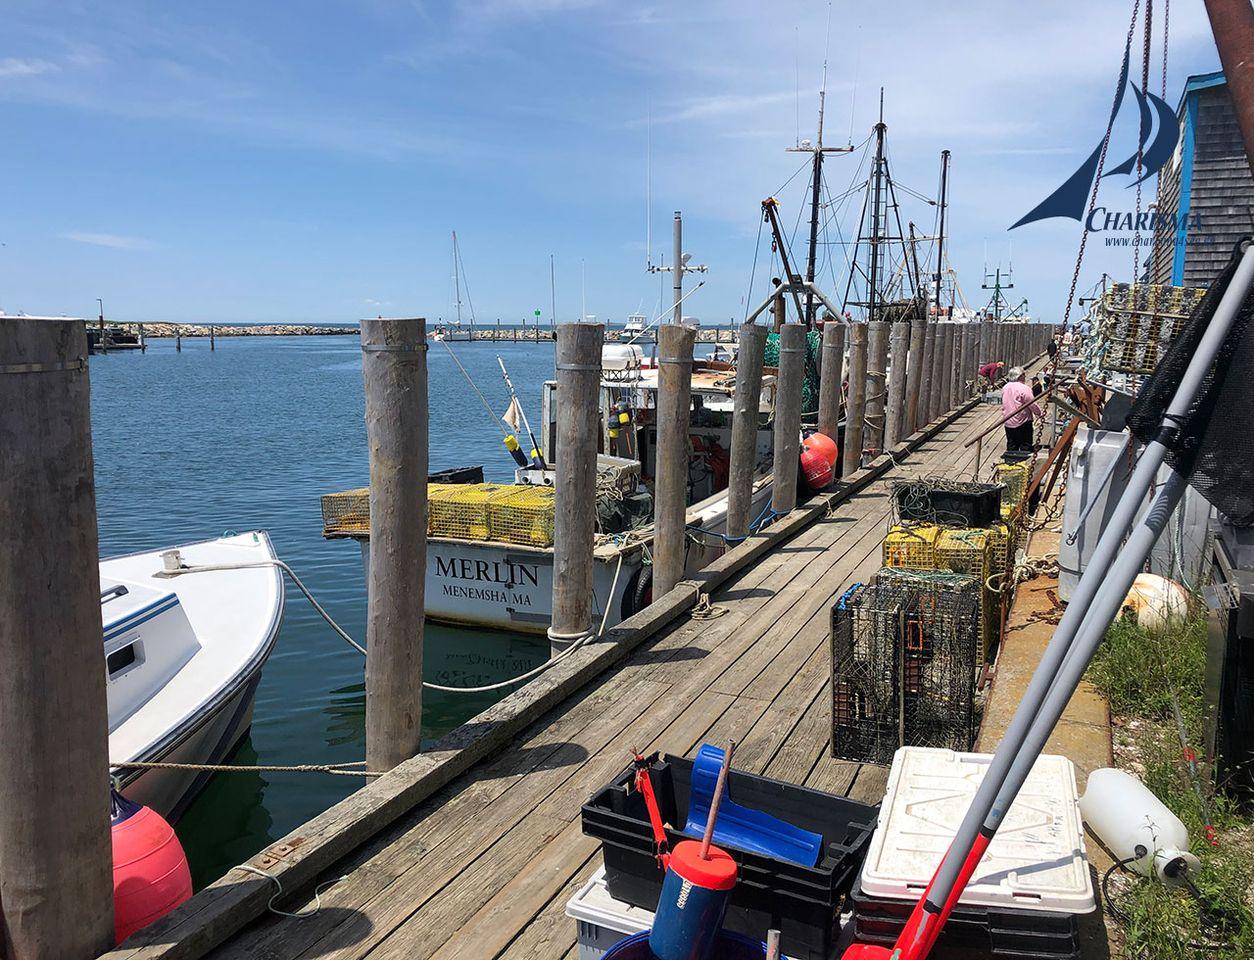 Fischerheihafen Menemscha-Harbor